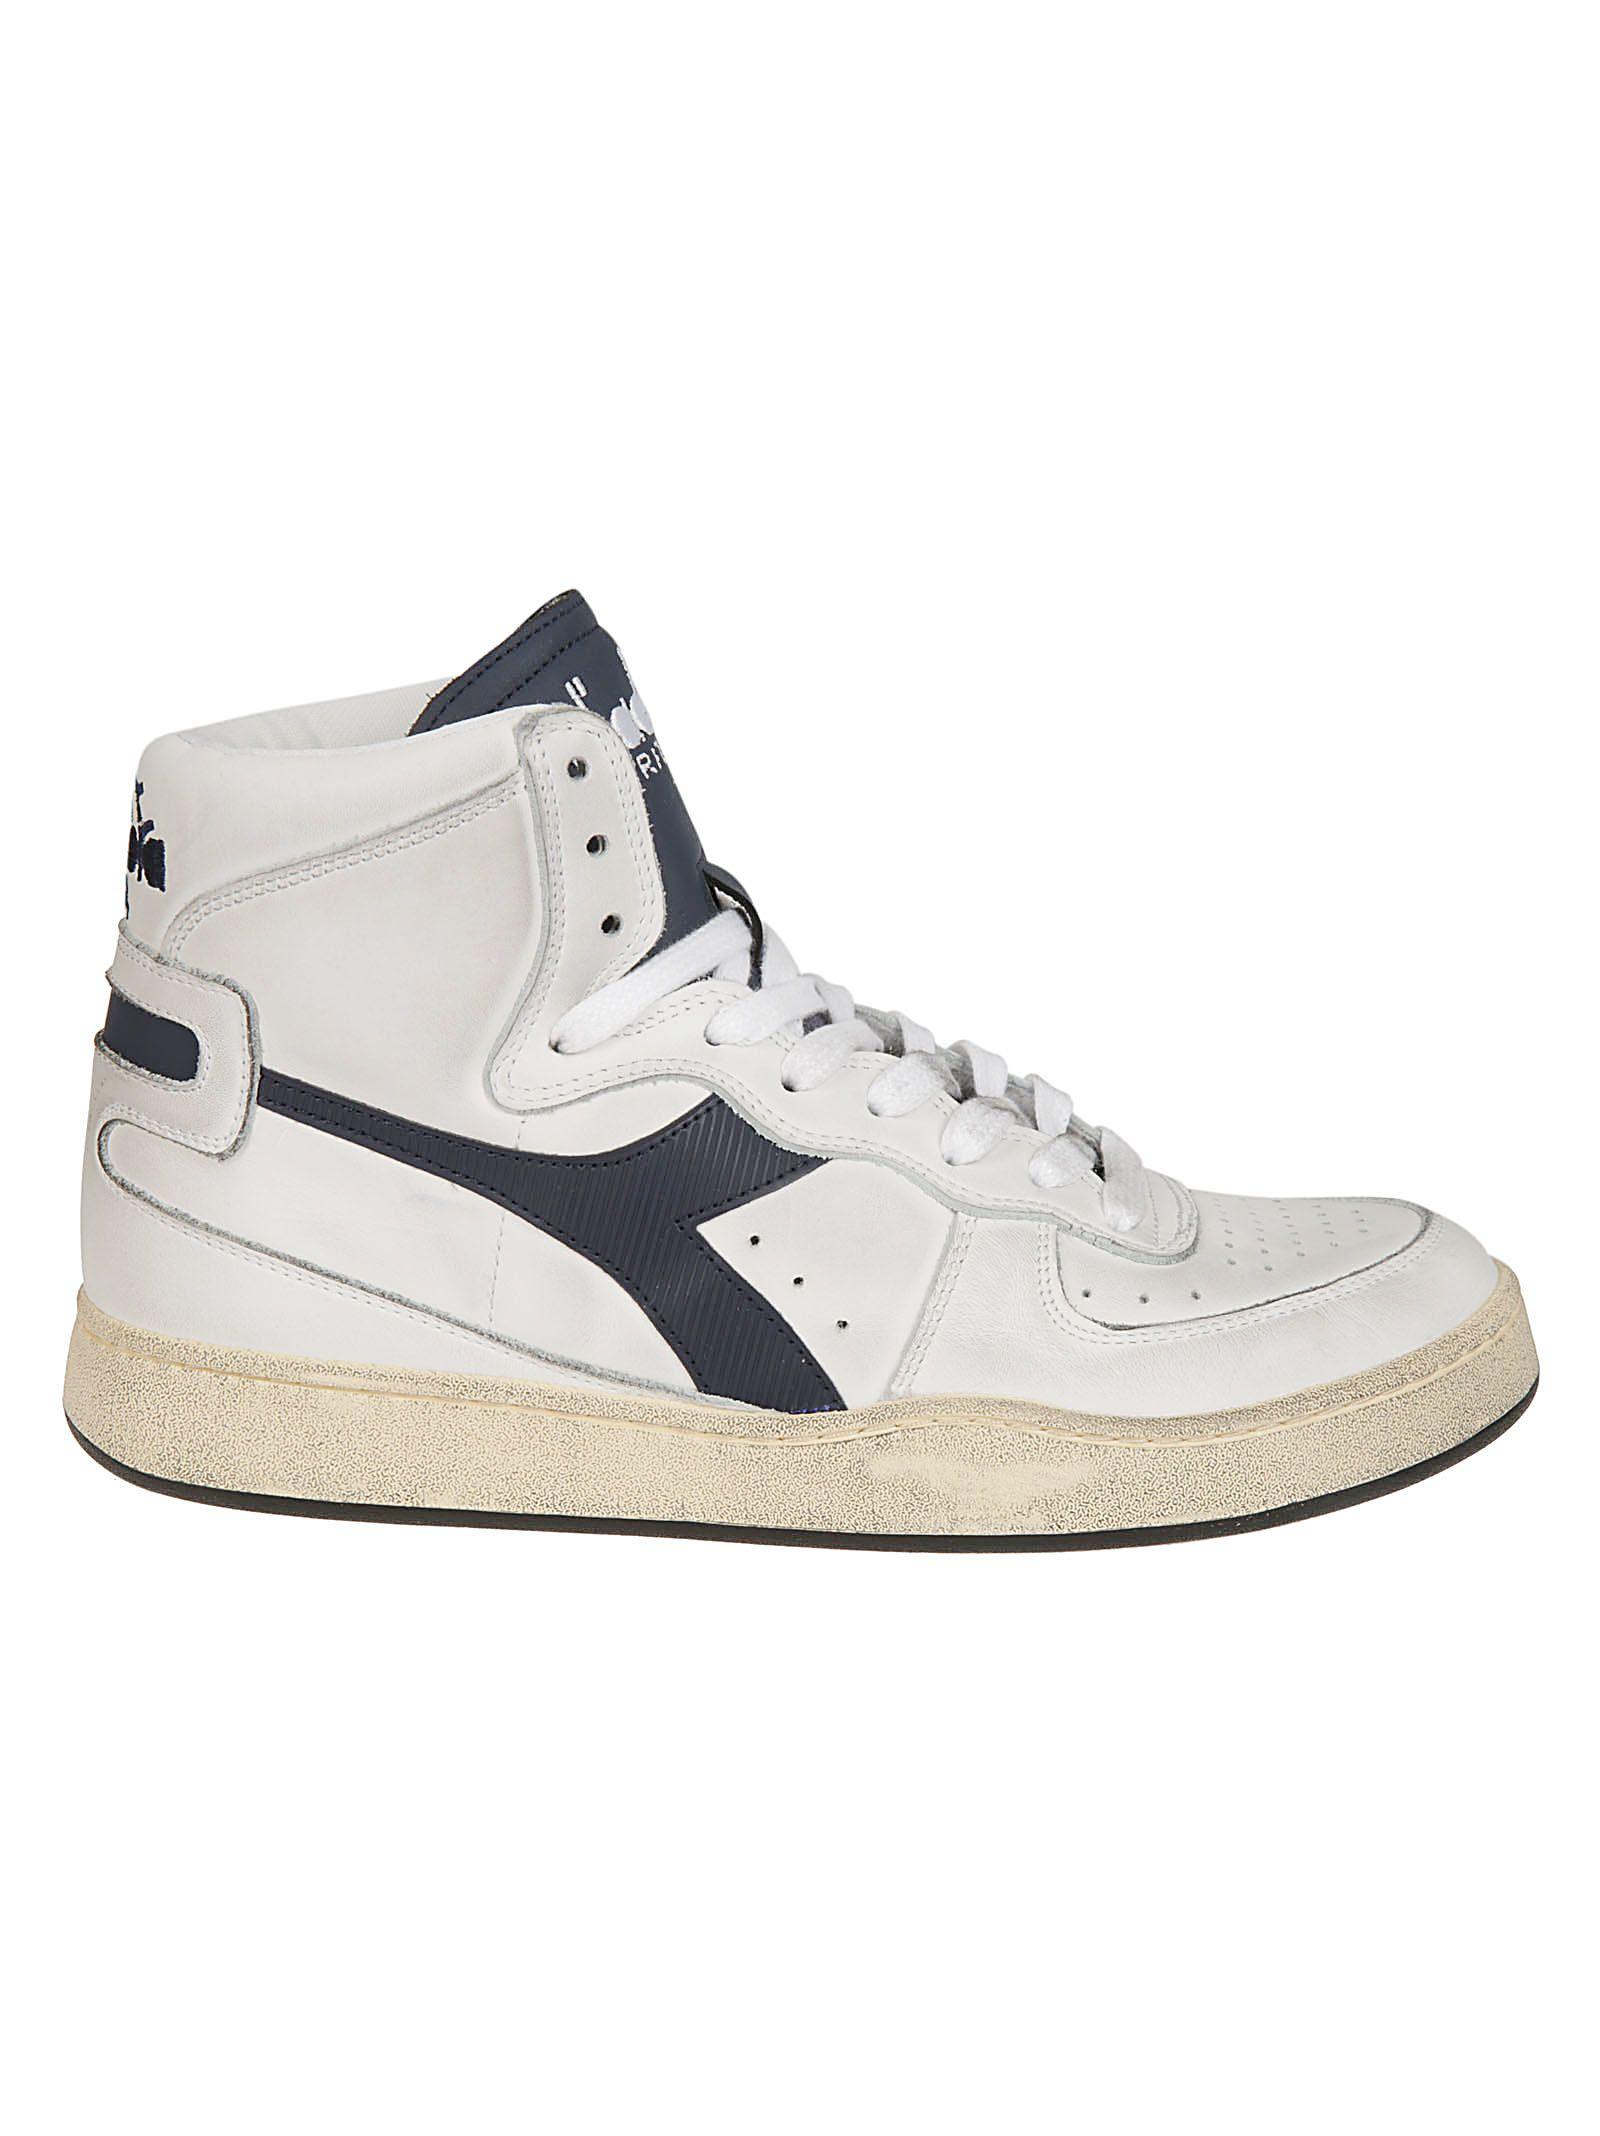 DIADORA Classic Hi-Top Sneakers in White